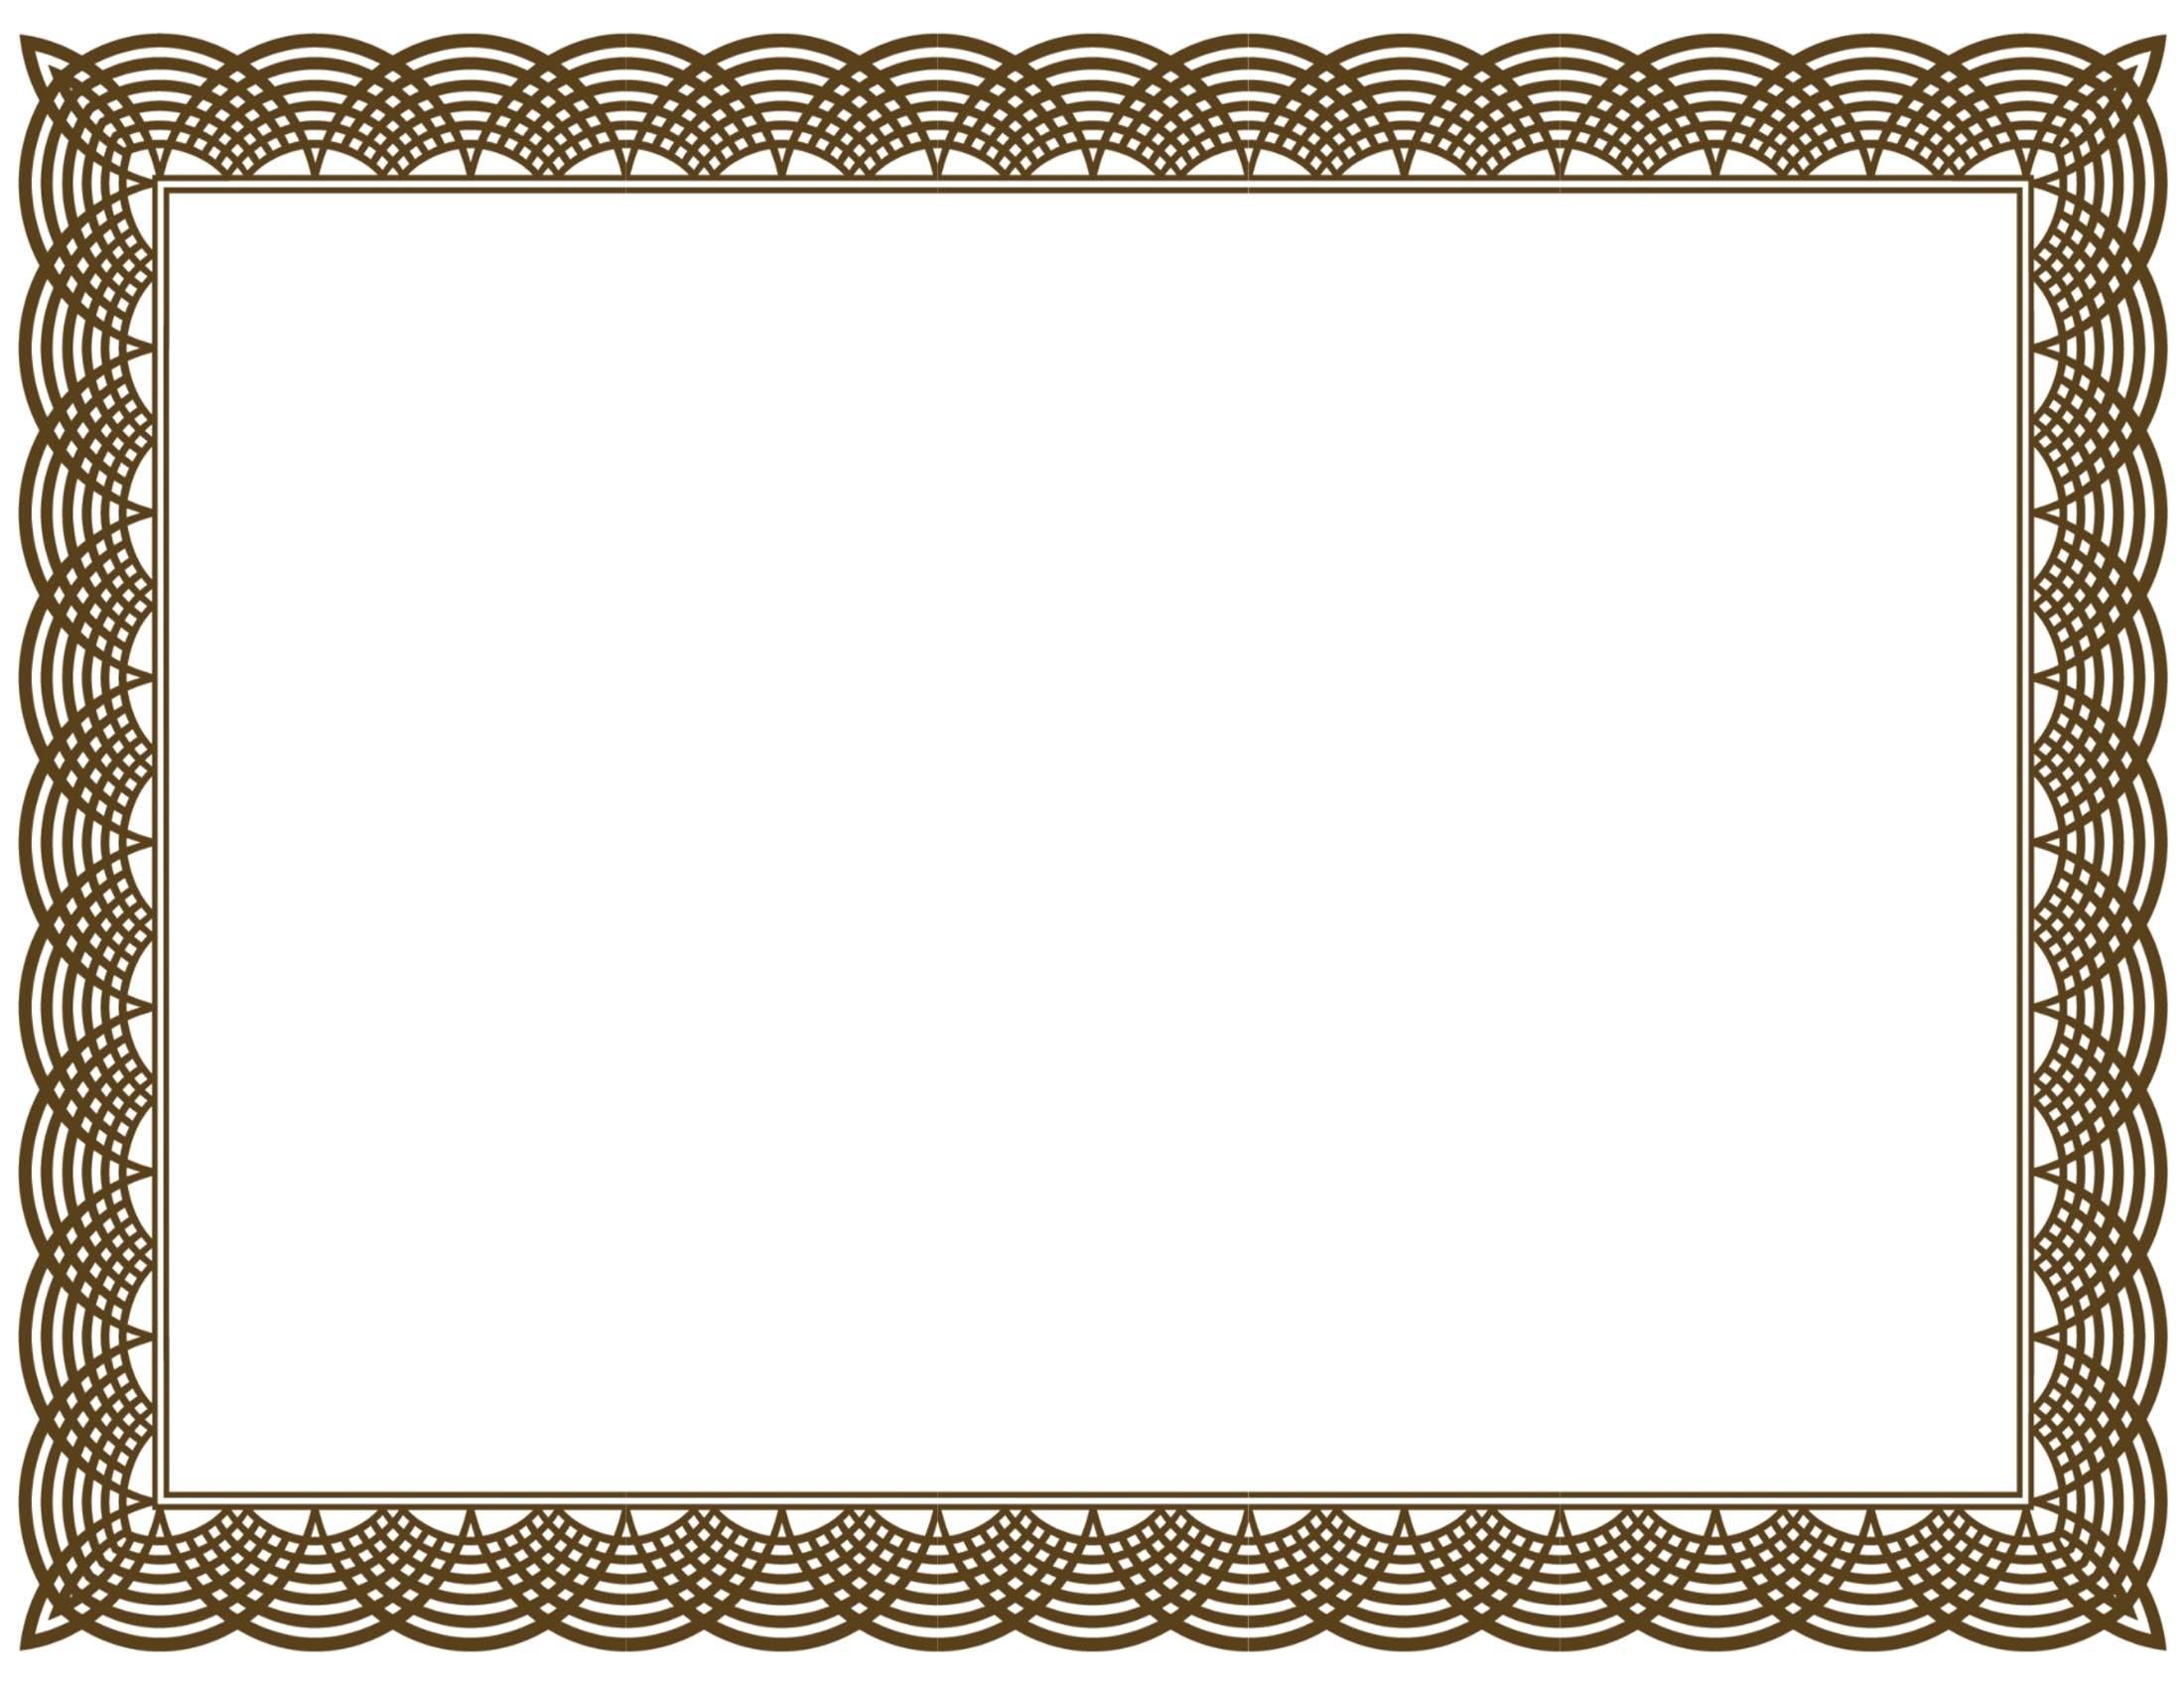 Certificate border clipart free download 1 » Clipart Portal.